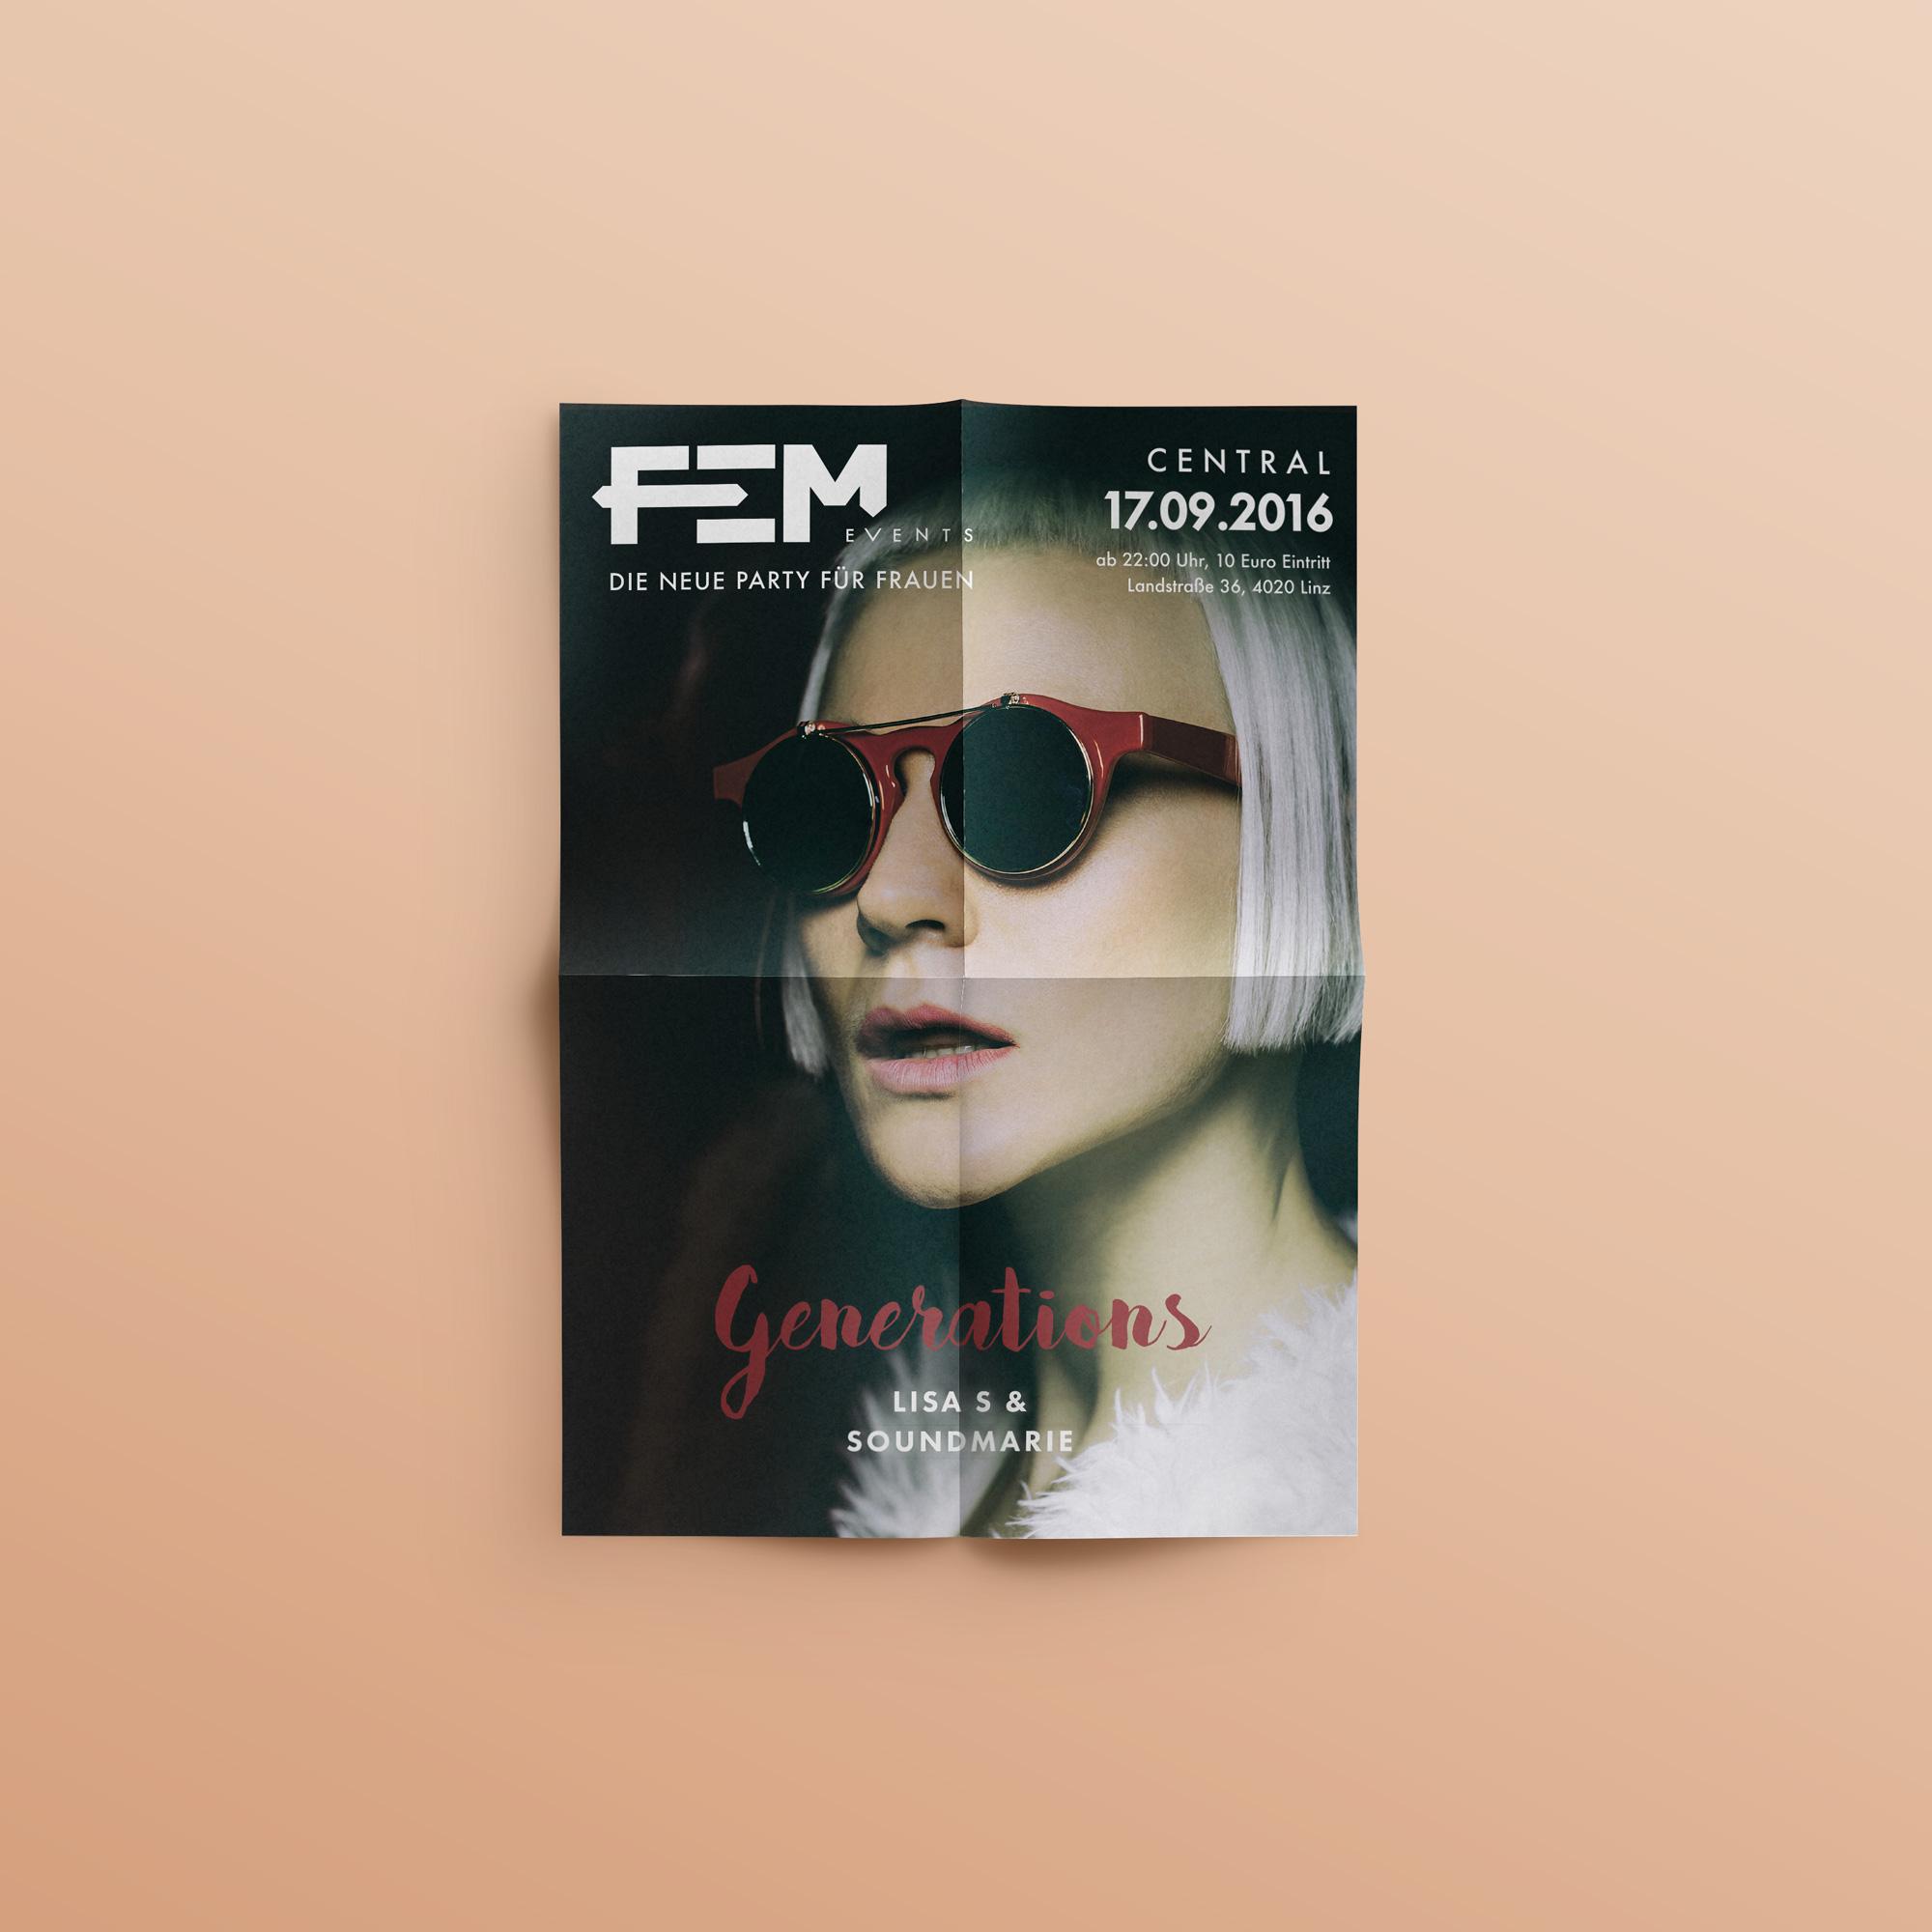 FEM_Generations_Poster